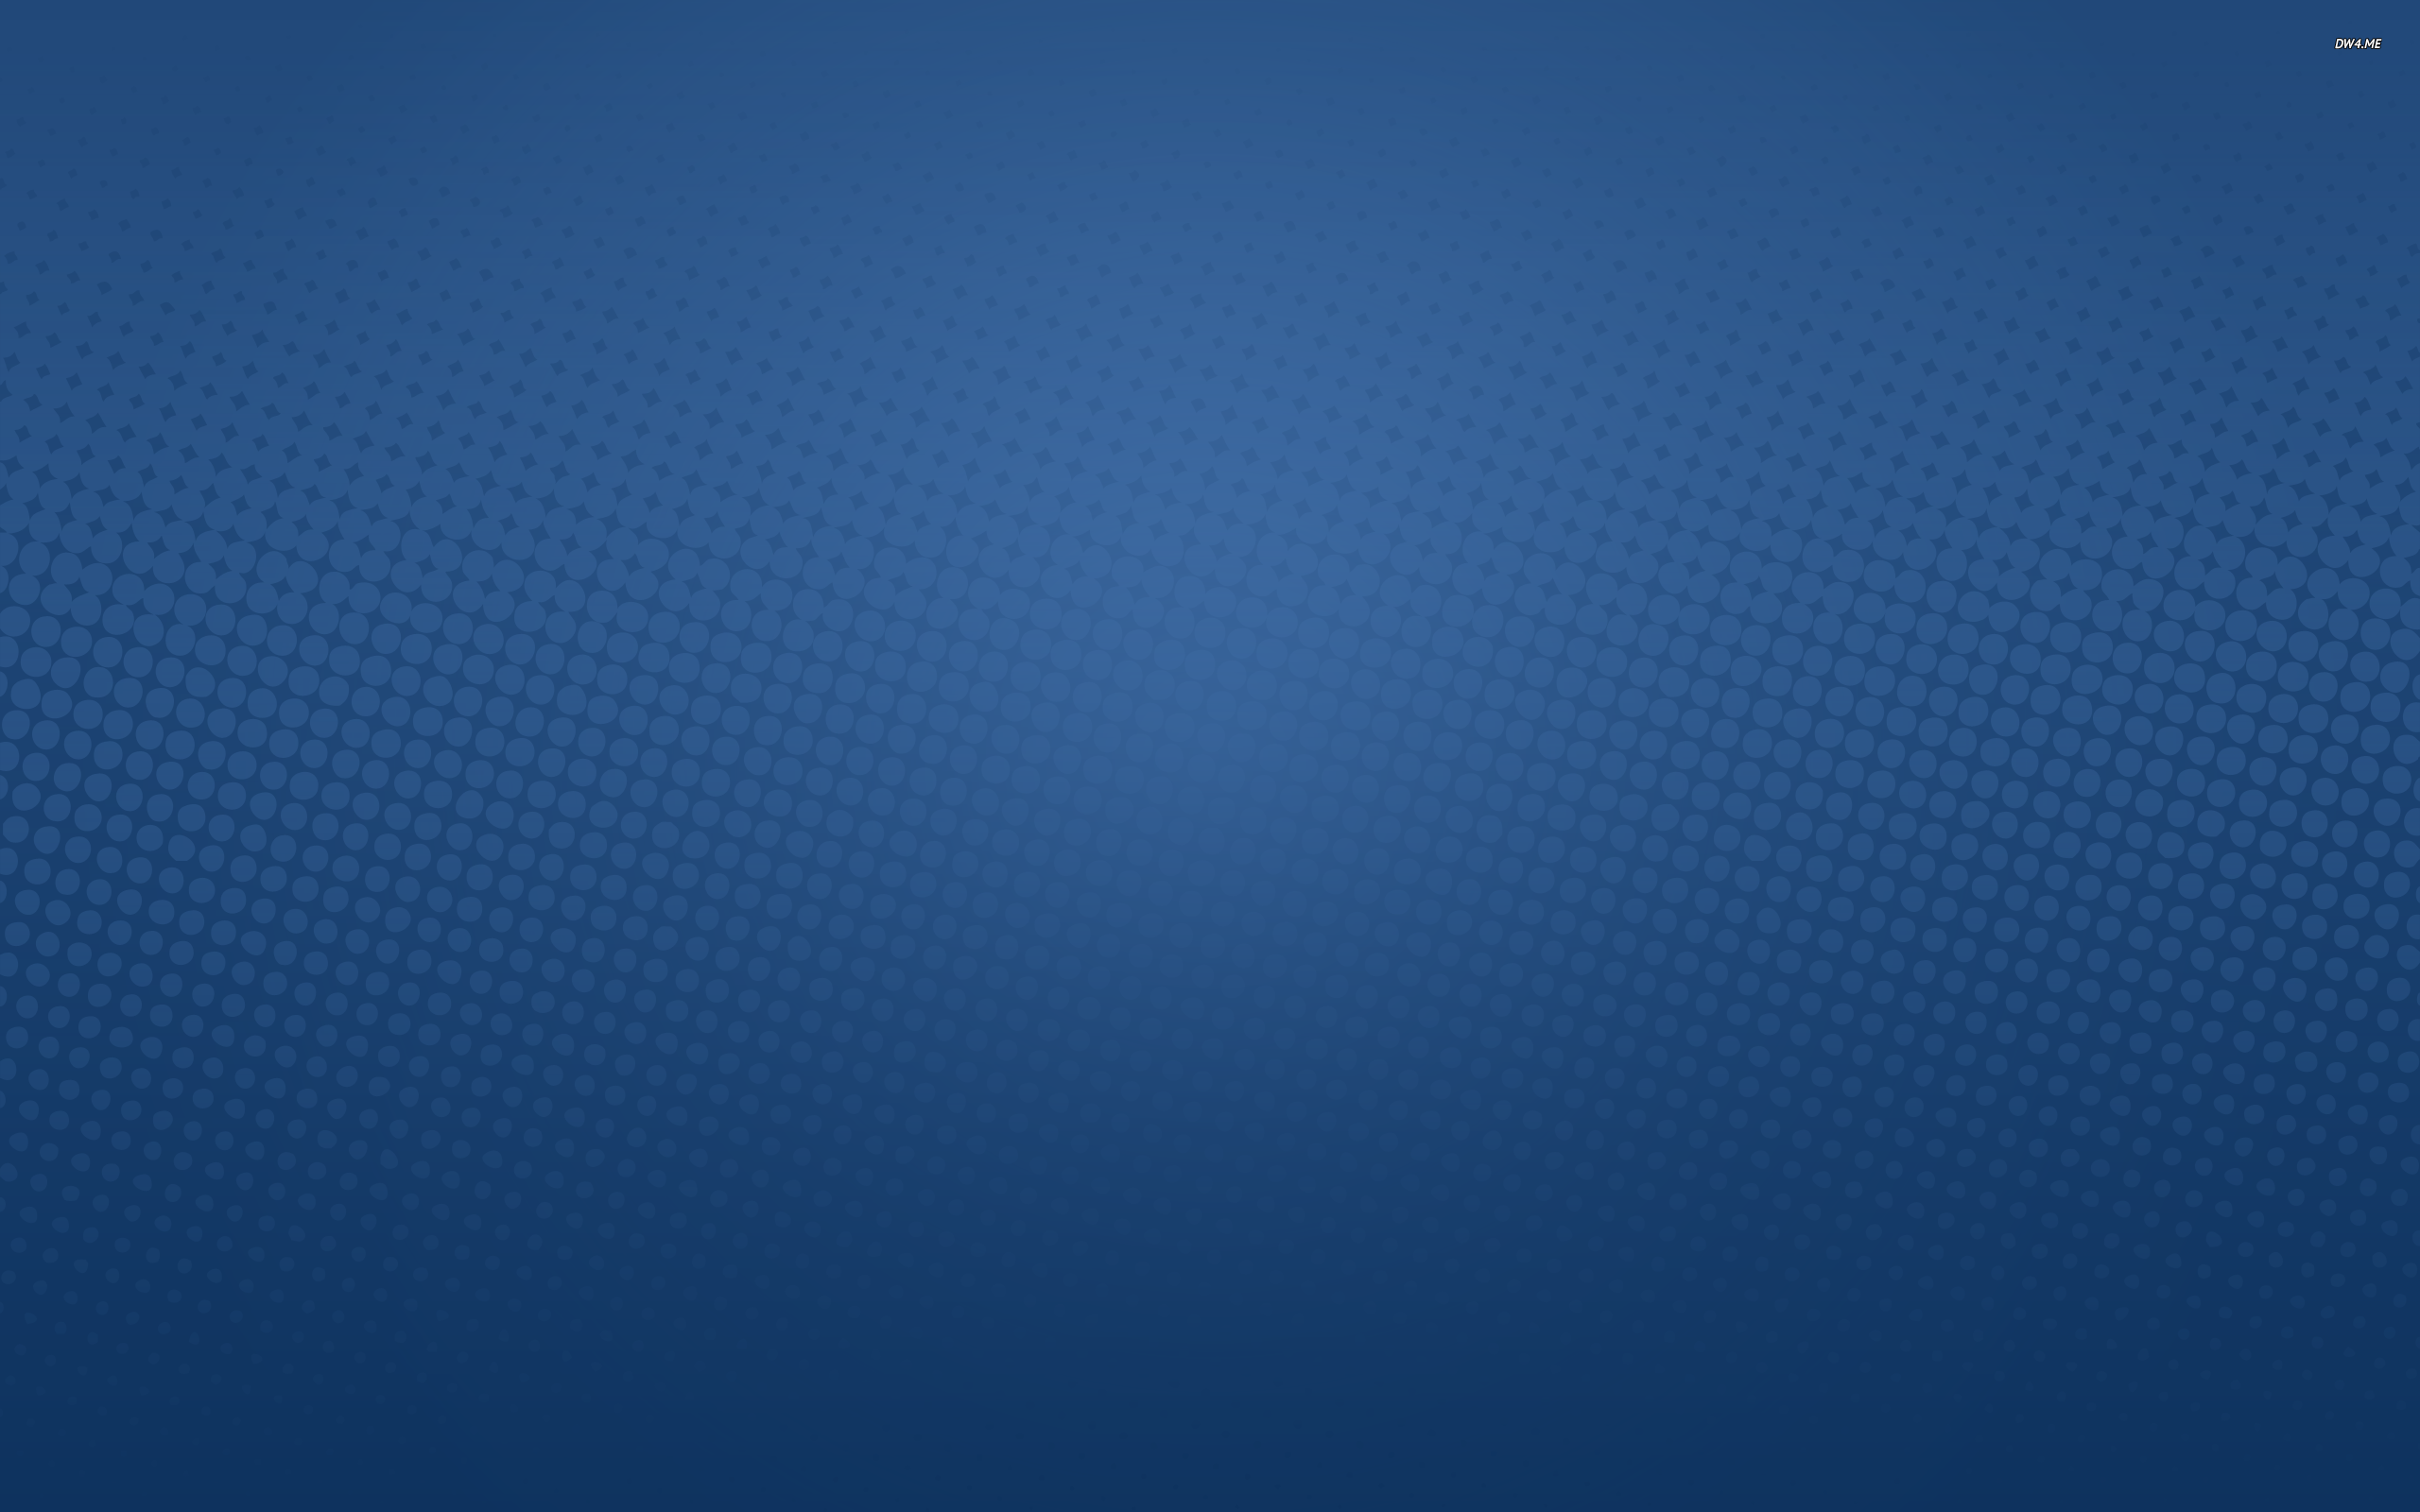 GMT798   Wallpaper Blue Blue HD Backgrounds   33 Large Images 2560x1600